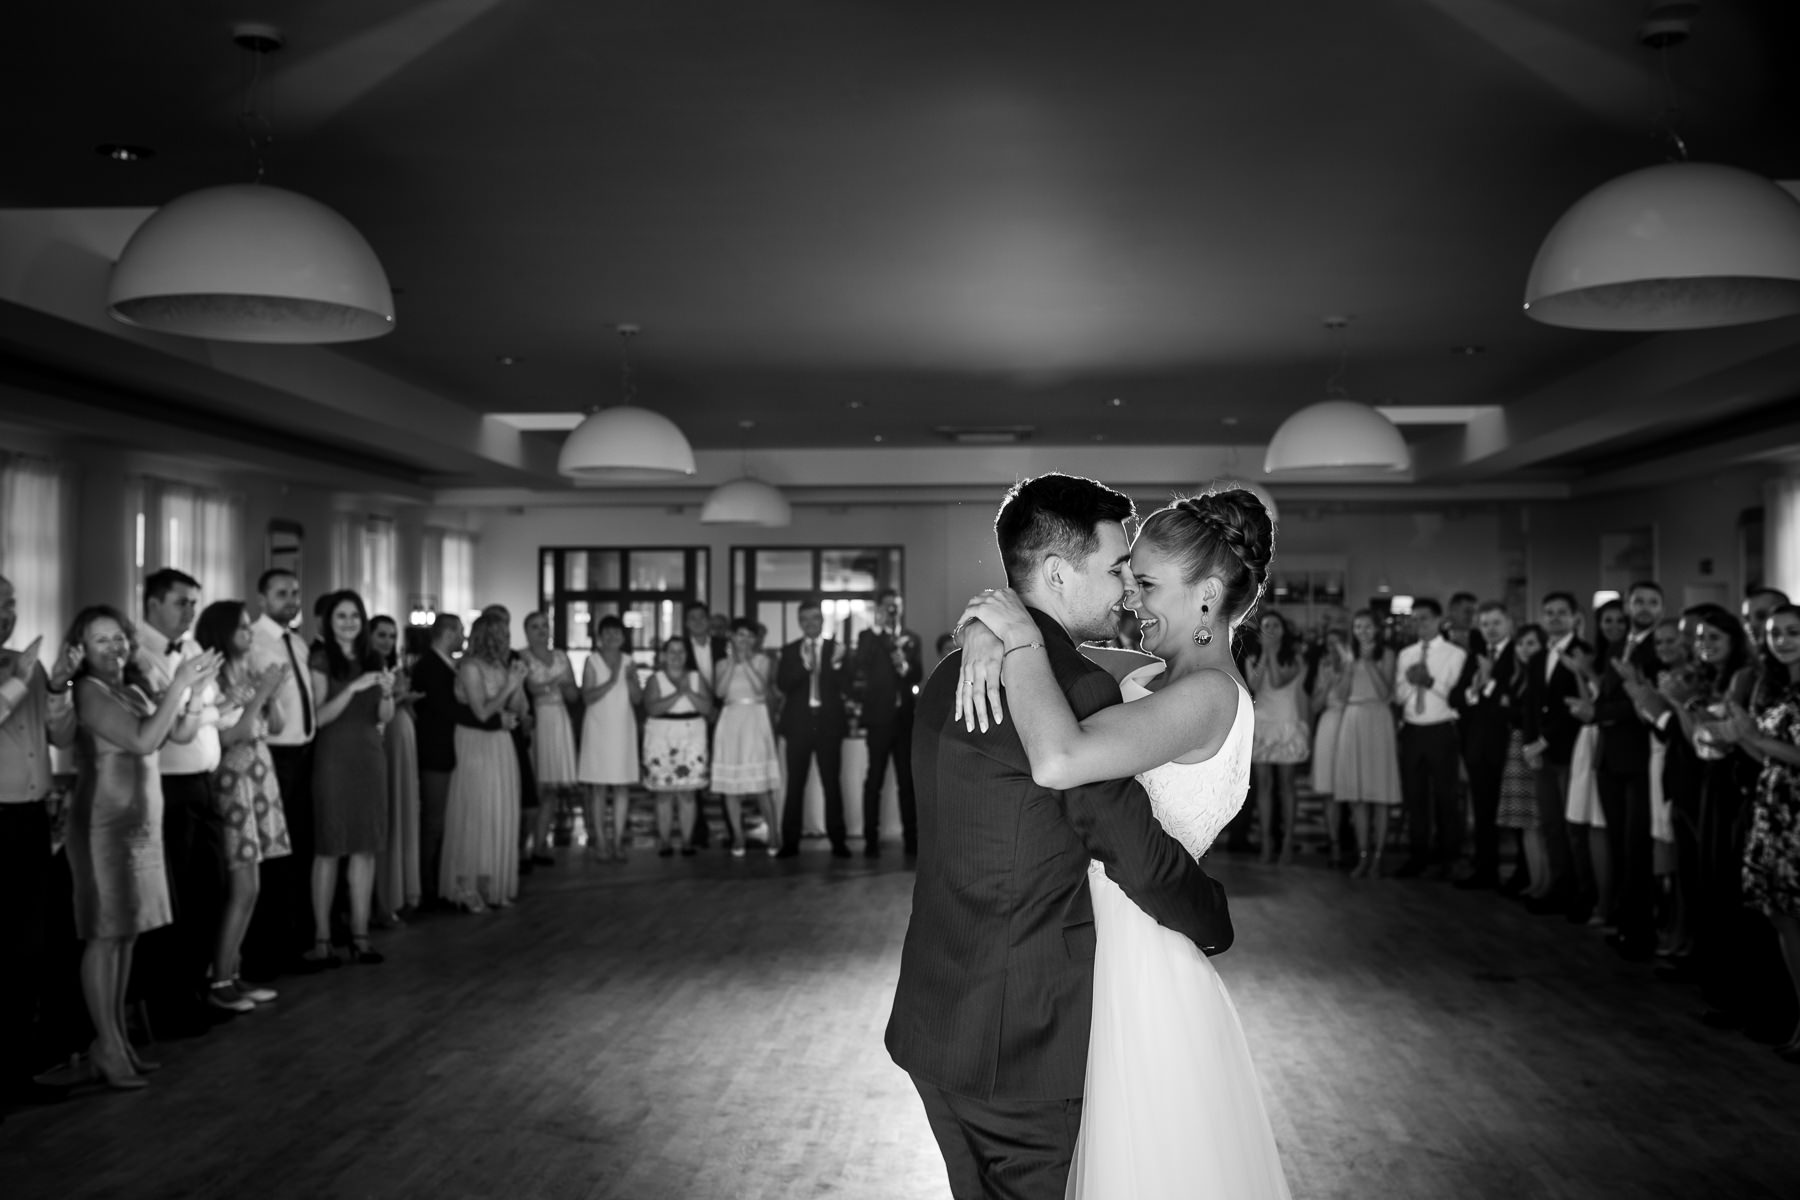 biała wstążka wesele zabawa